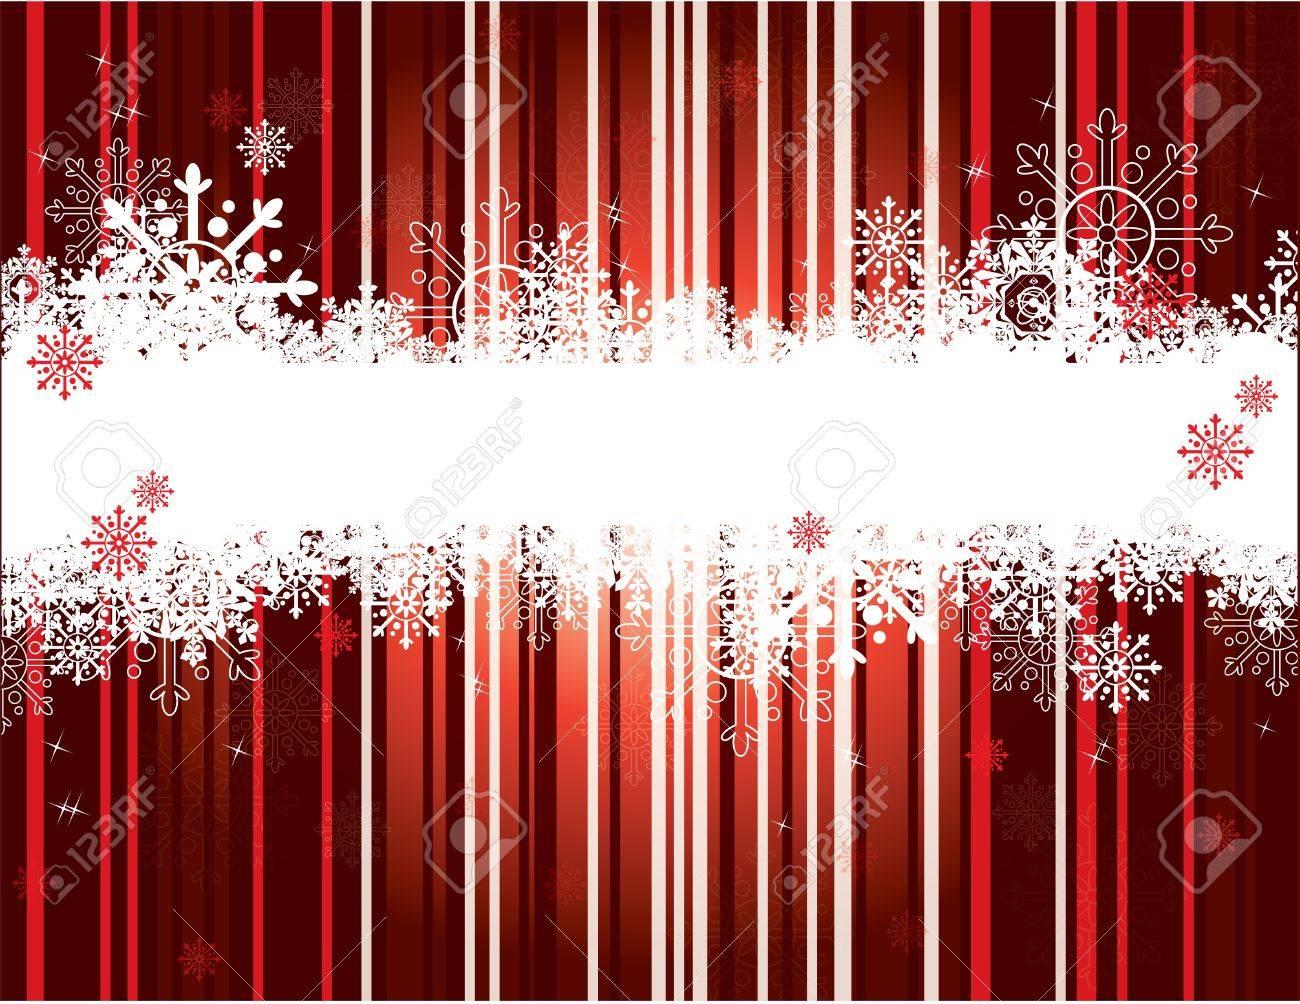 Christmas Background  Vector Illustration Stock Vector - 15013521